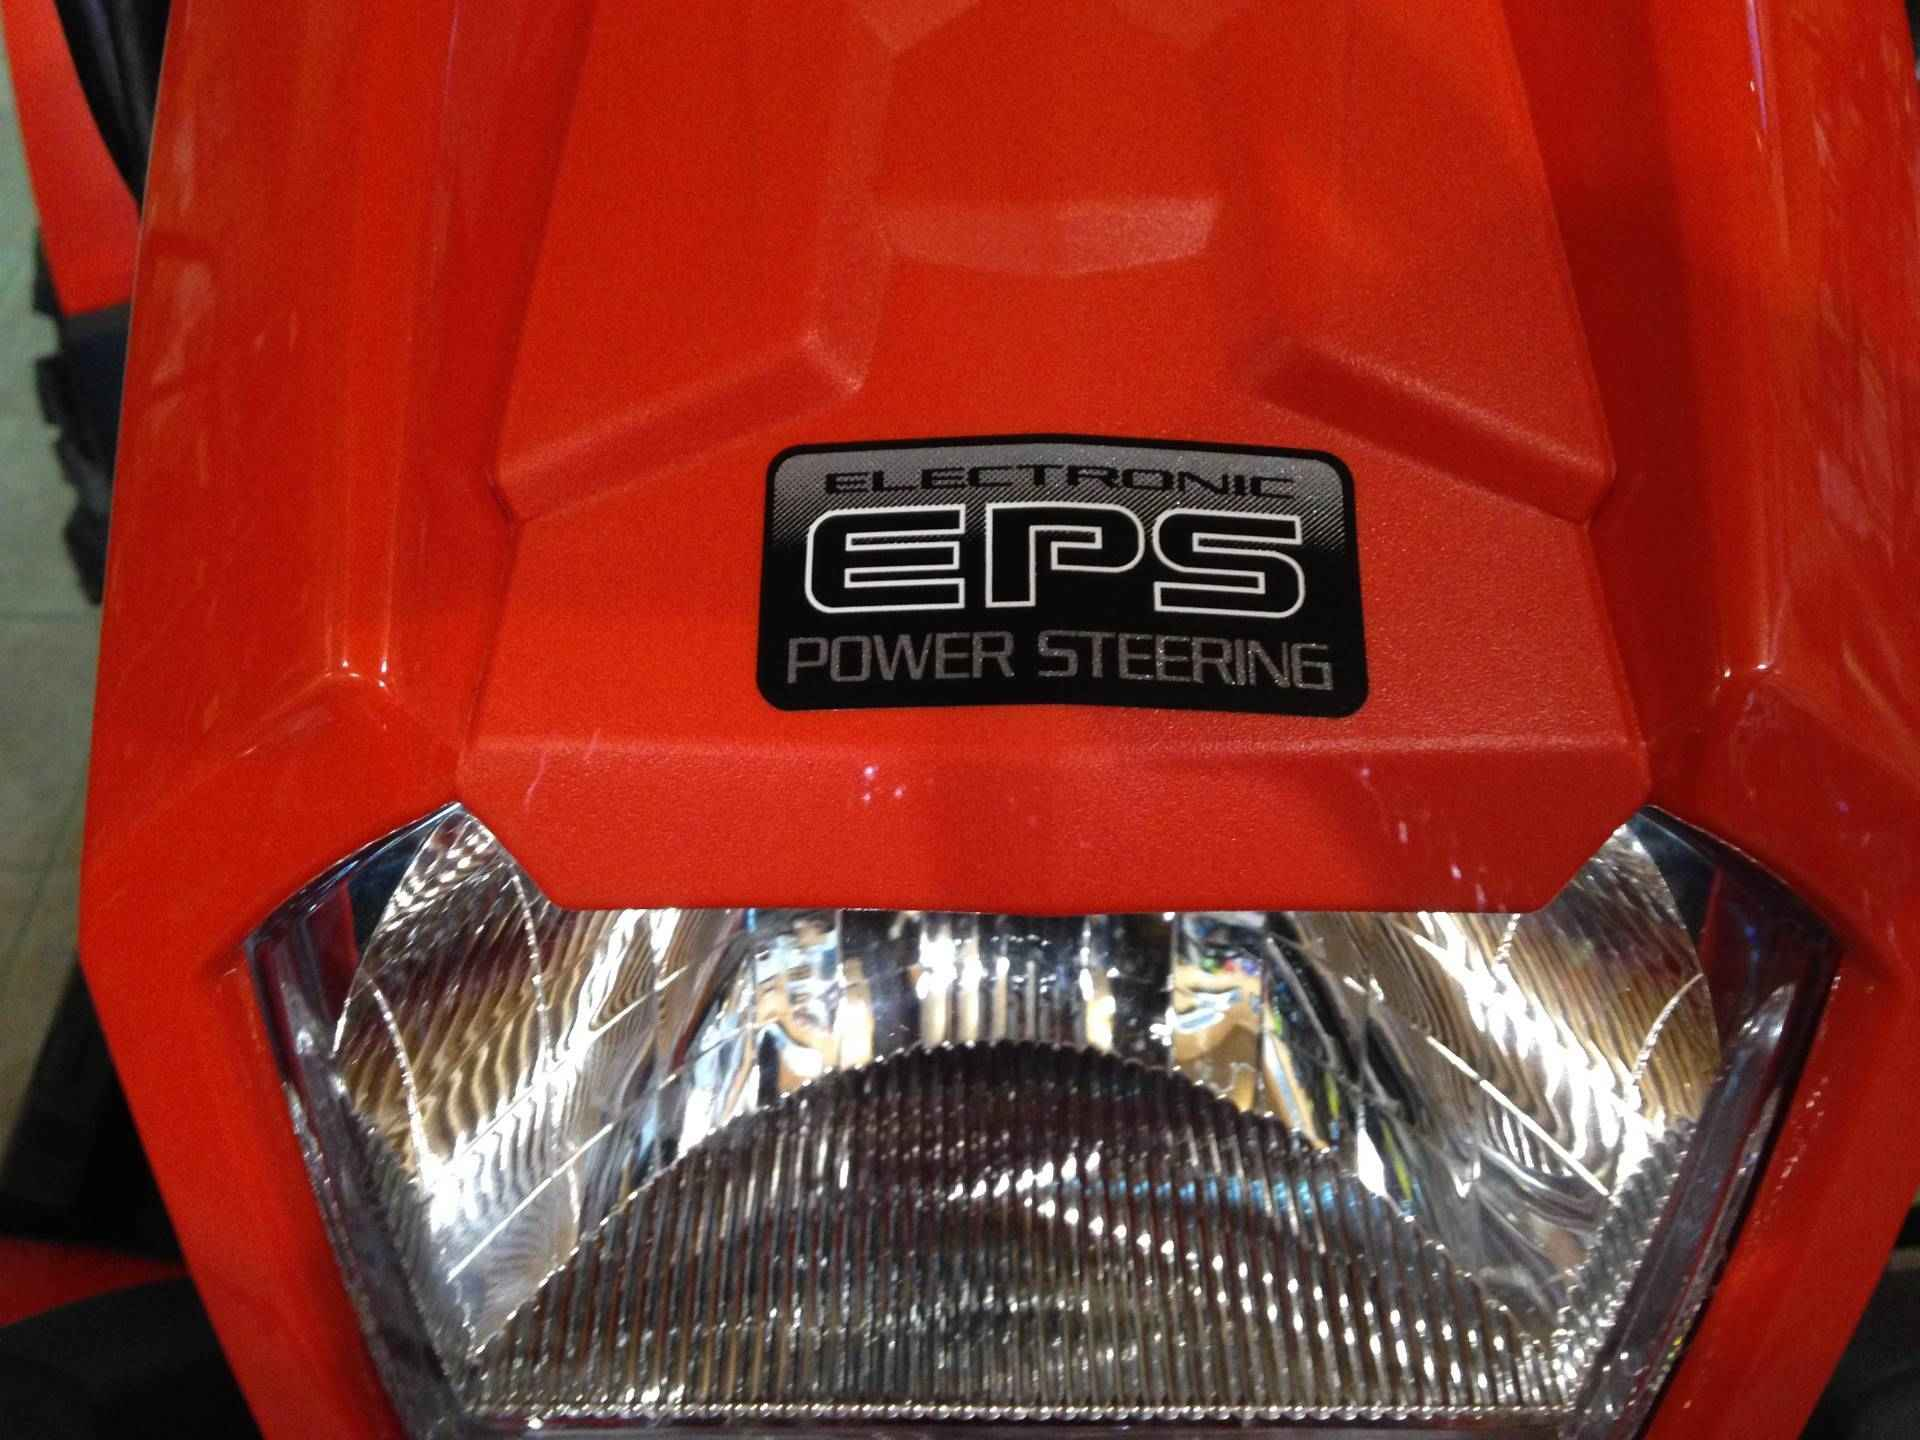 New 2018 Polaris Sportsman 570 EPS ATVs For Sale in Wisconsin on  atvtrades com